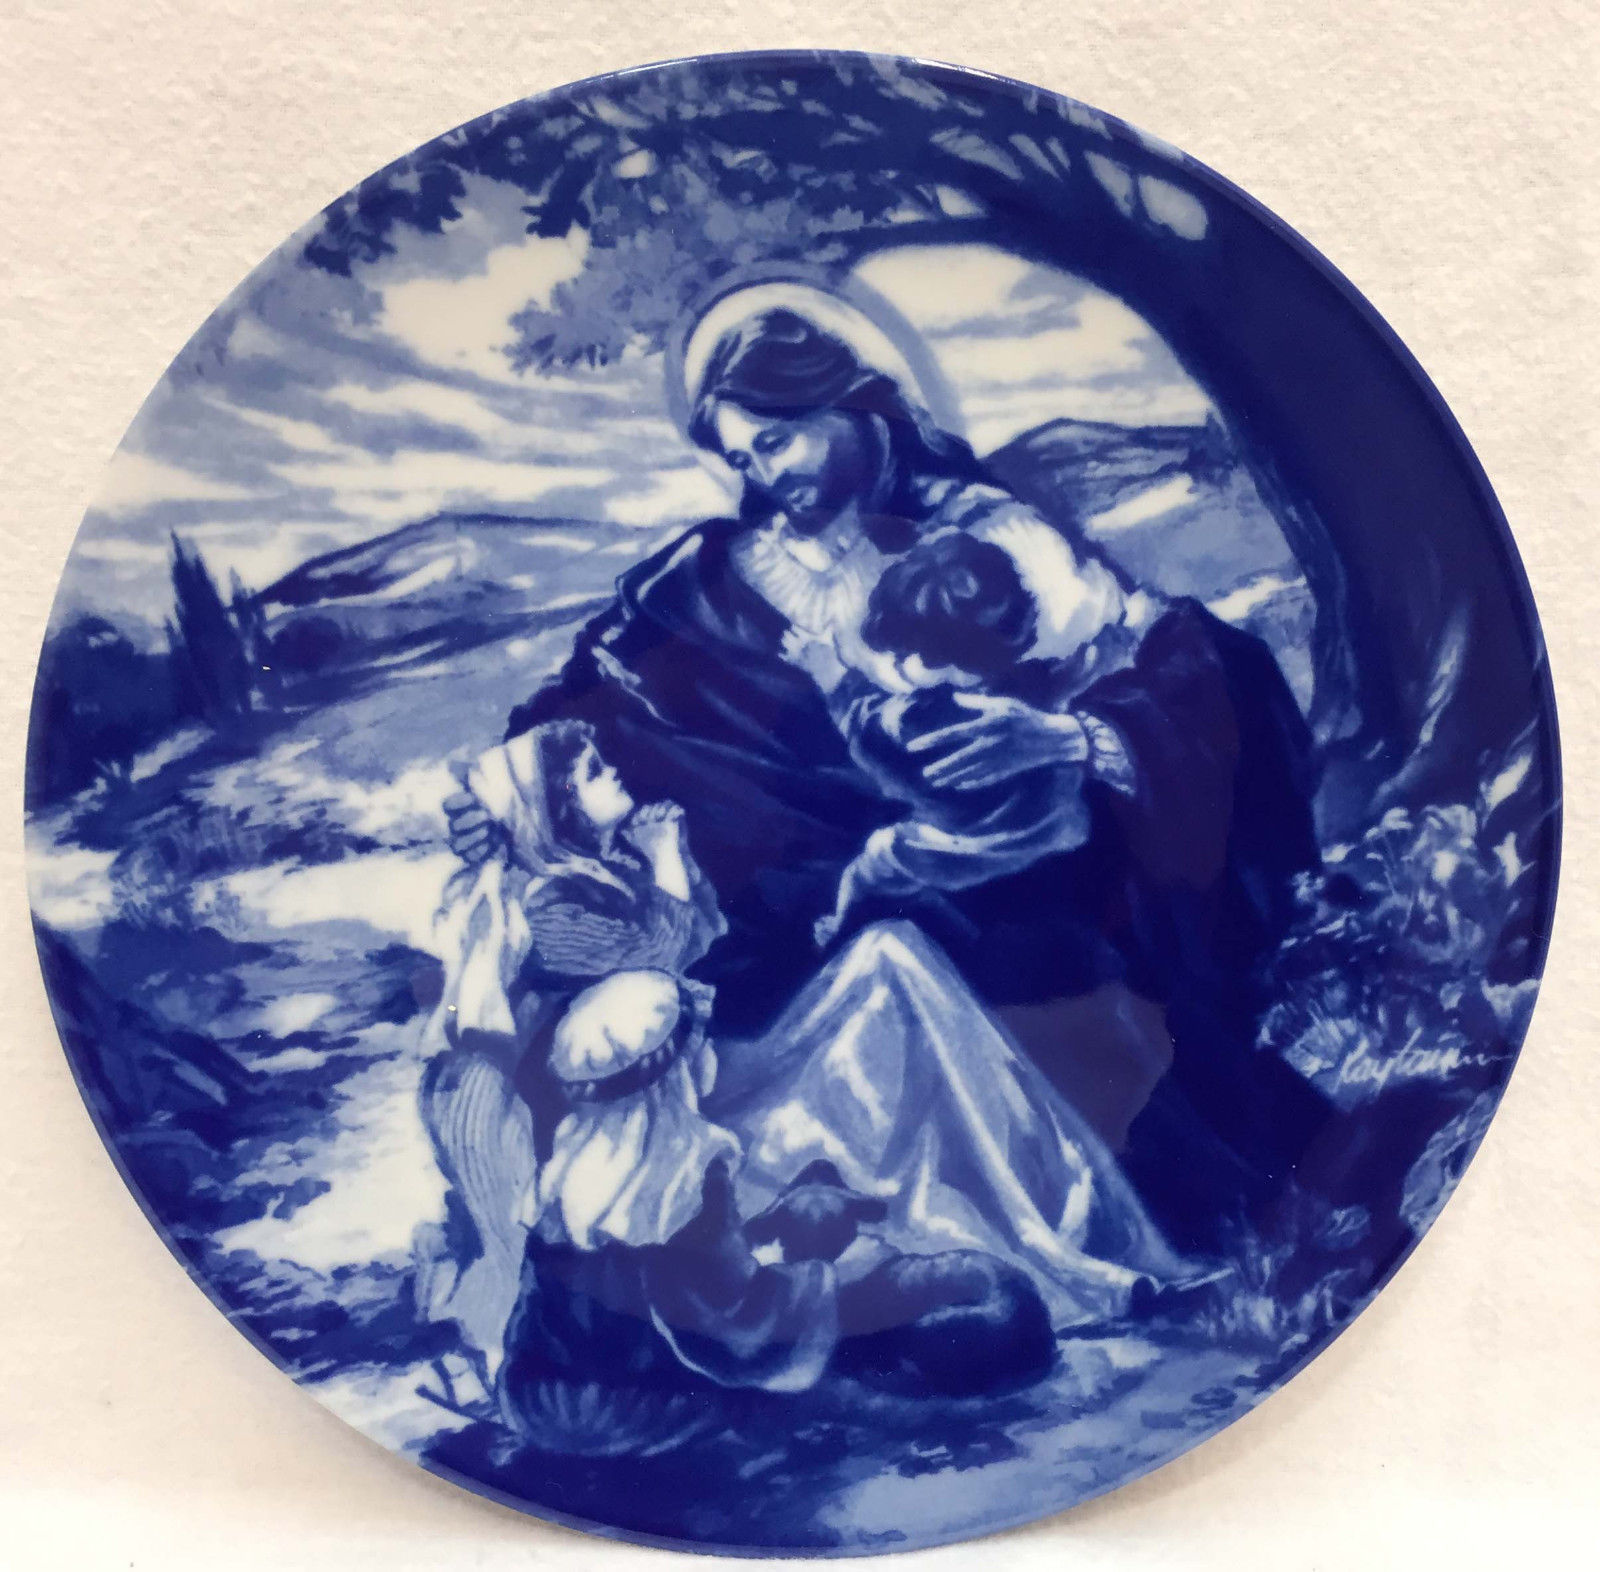 Jesus Christ Bless The Little Children Collectors Plate Avon Cobalt Blue 1992